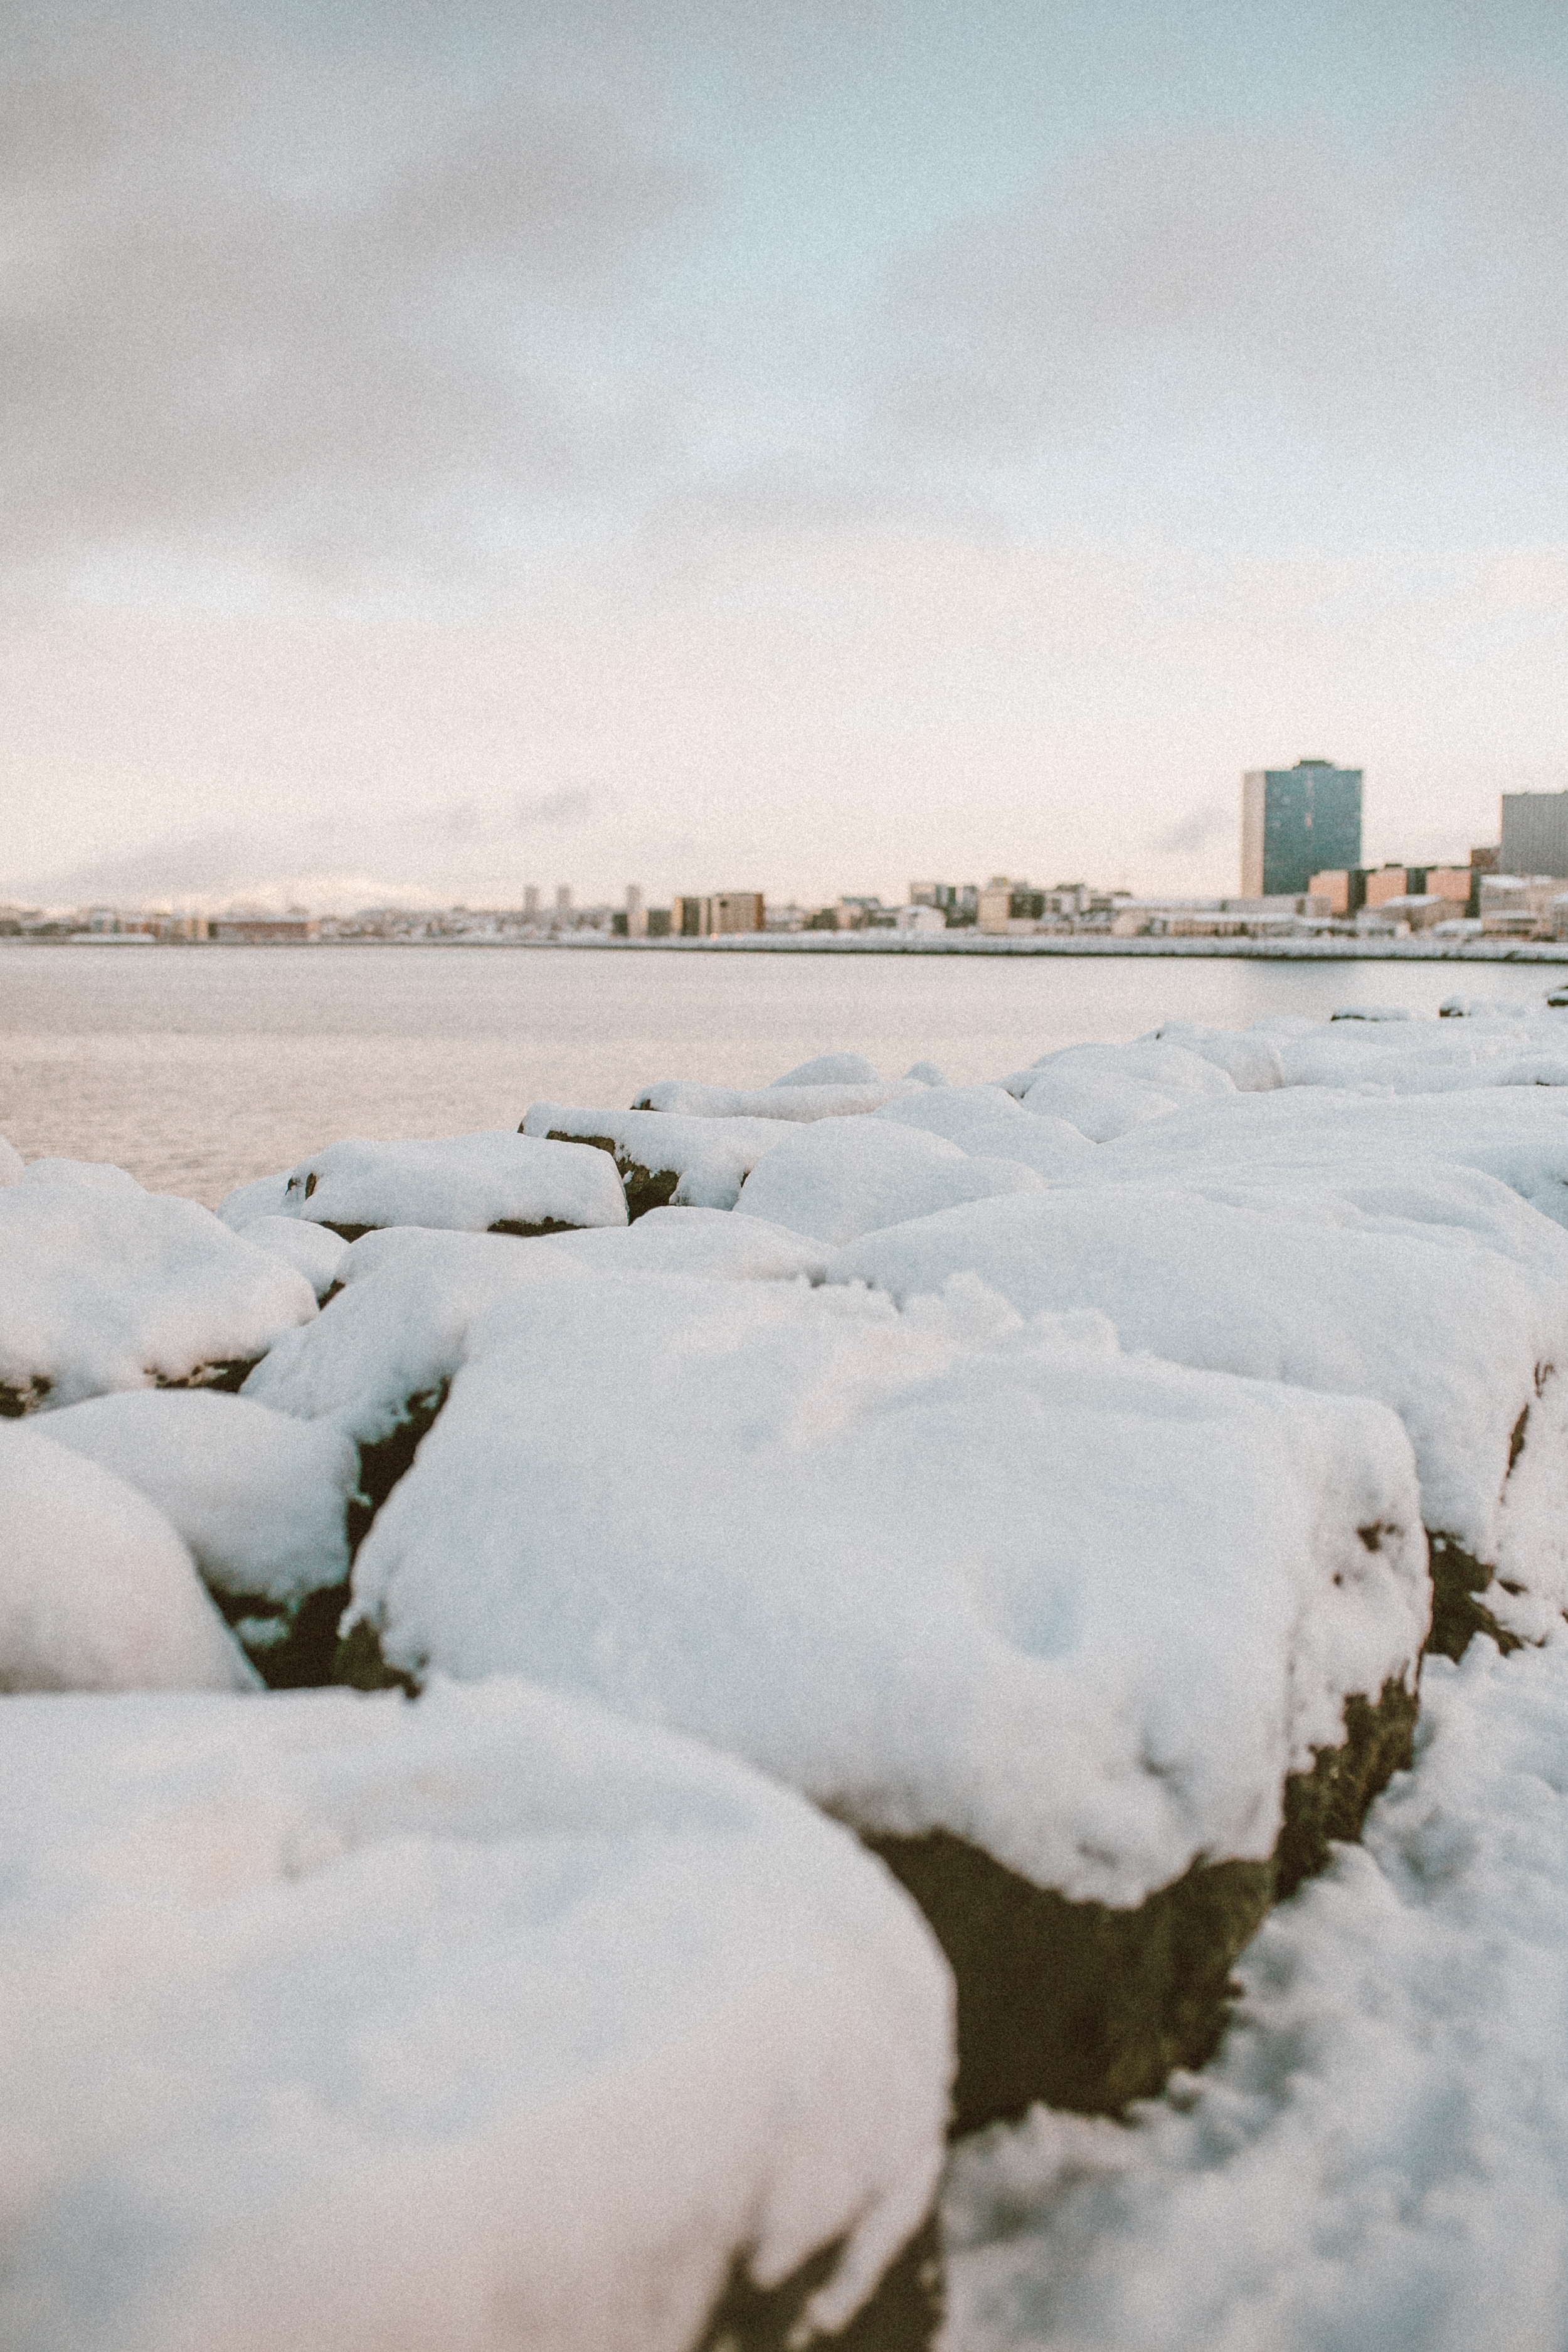 livvyland-blog-olivia-watson-travel-lifestyle-blogger-iceland-road-trip-what-to-do-pack-reykjavik-noken-travel-guide-7